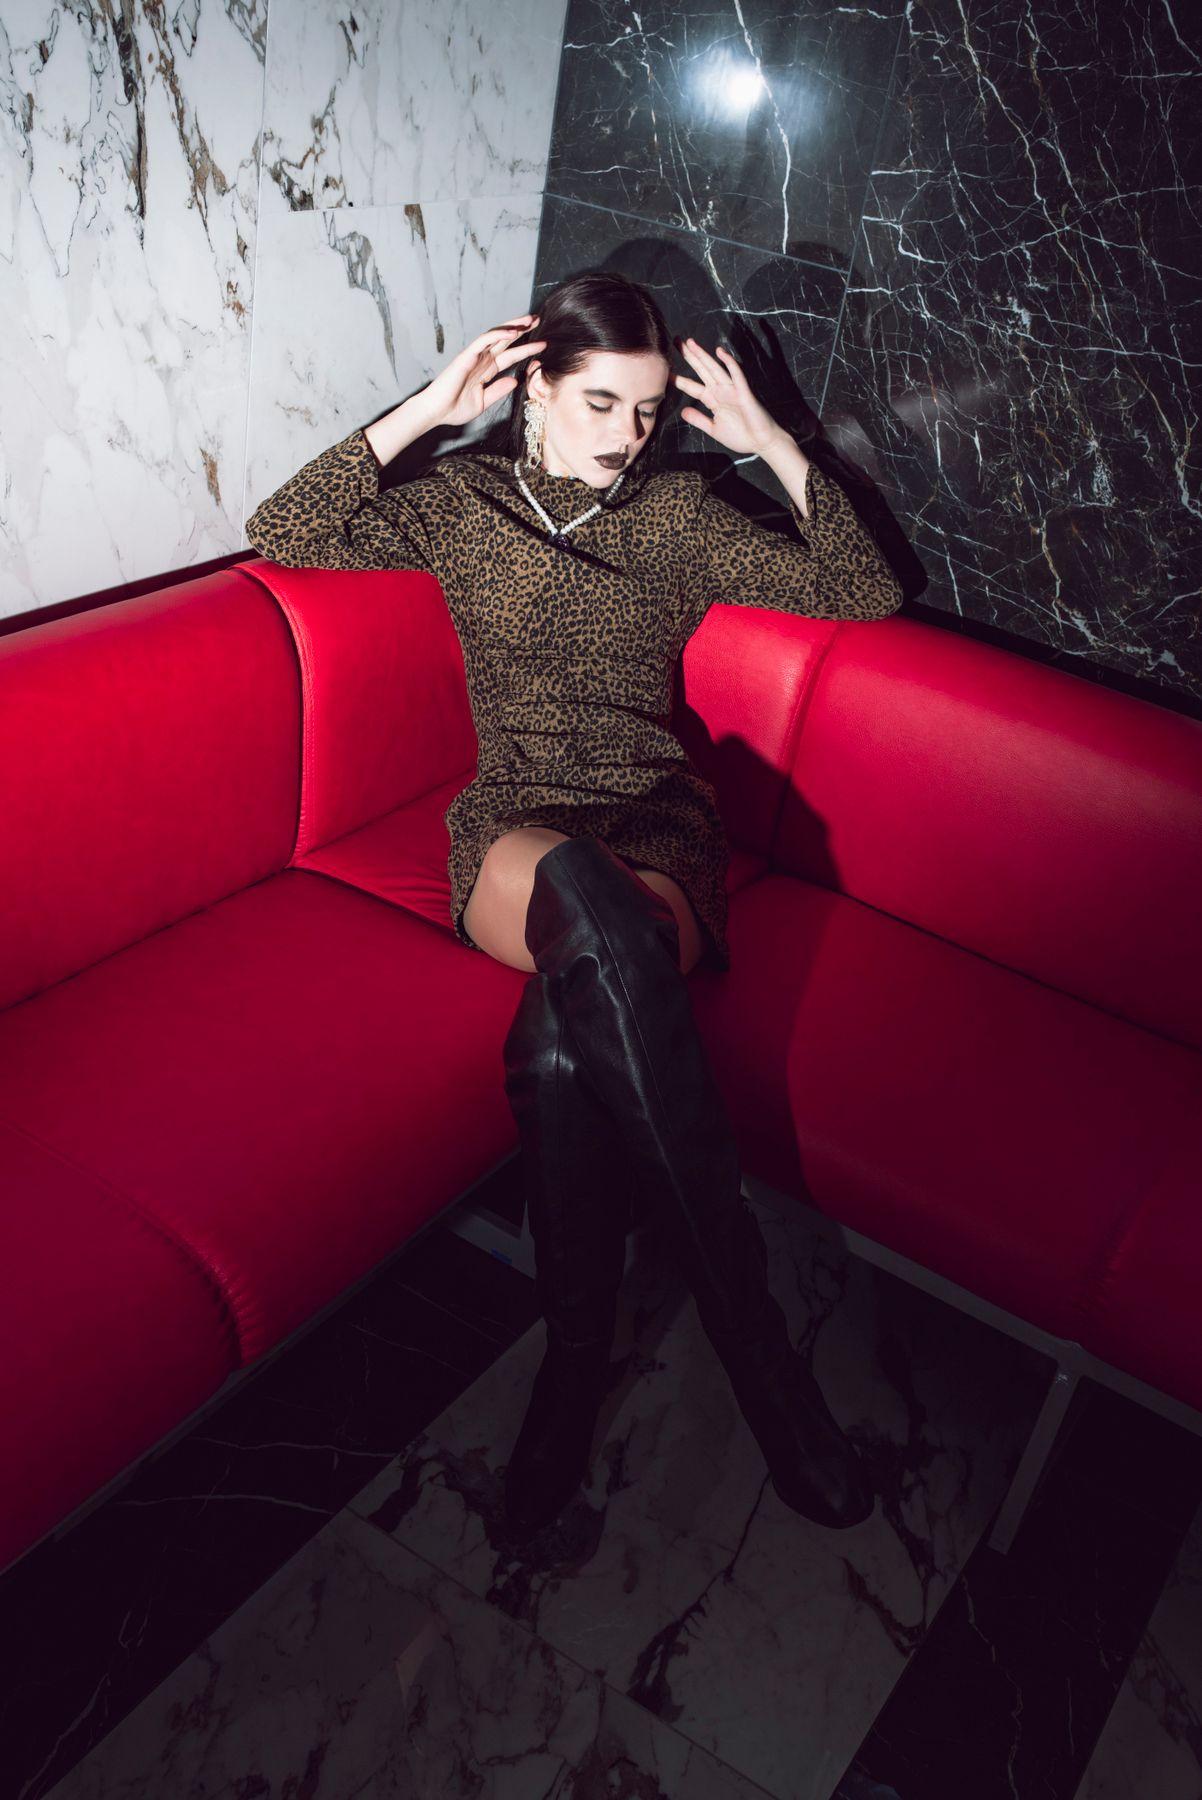 Gypsy Emancipation fashion style akulich girl model modeling topmodel styling moda